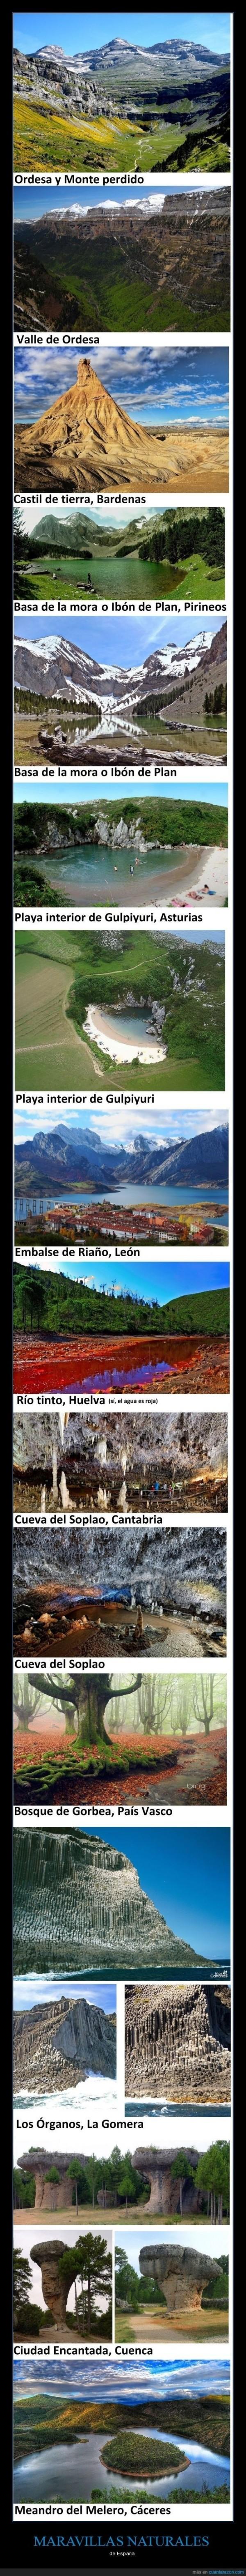 maravillas_naturales de España